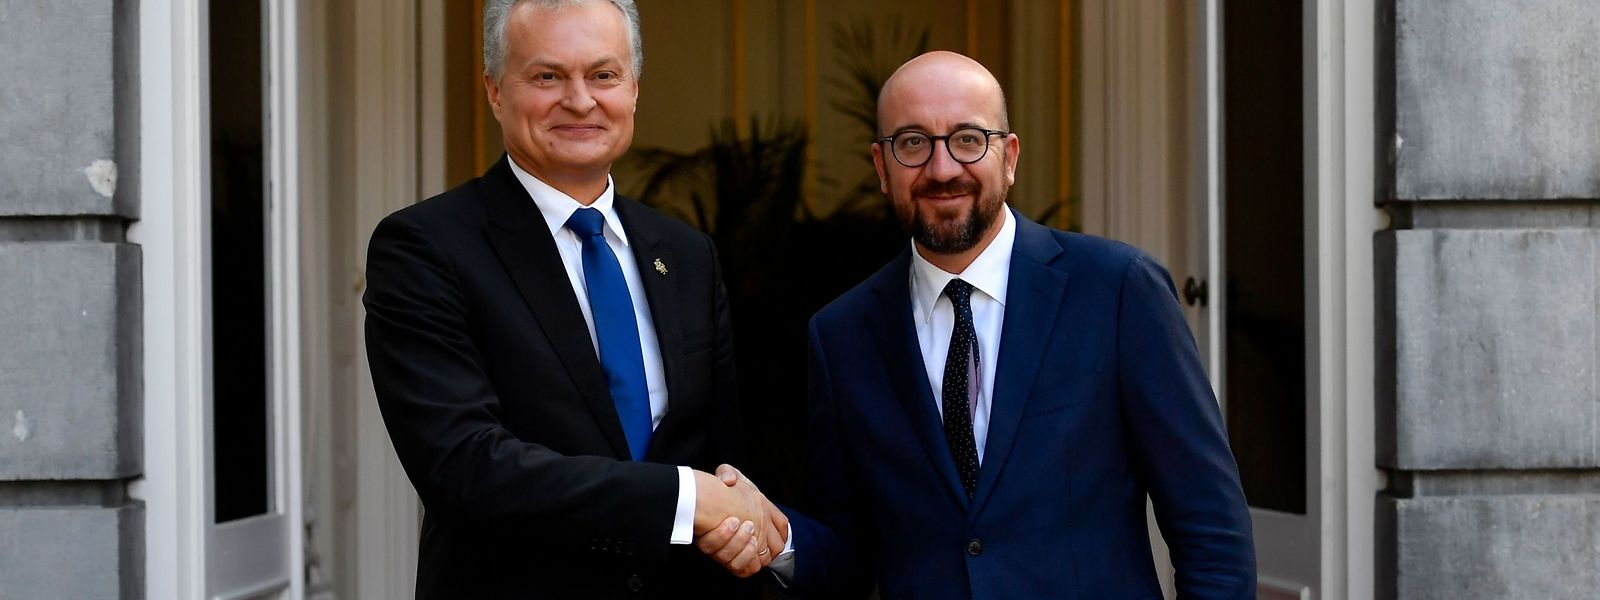 Charles Michel en compagnie du président lituanien Gitanas Nauseda.